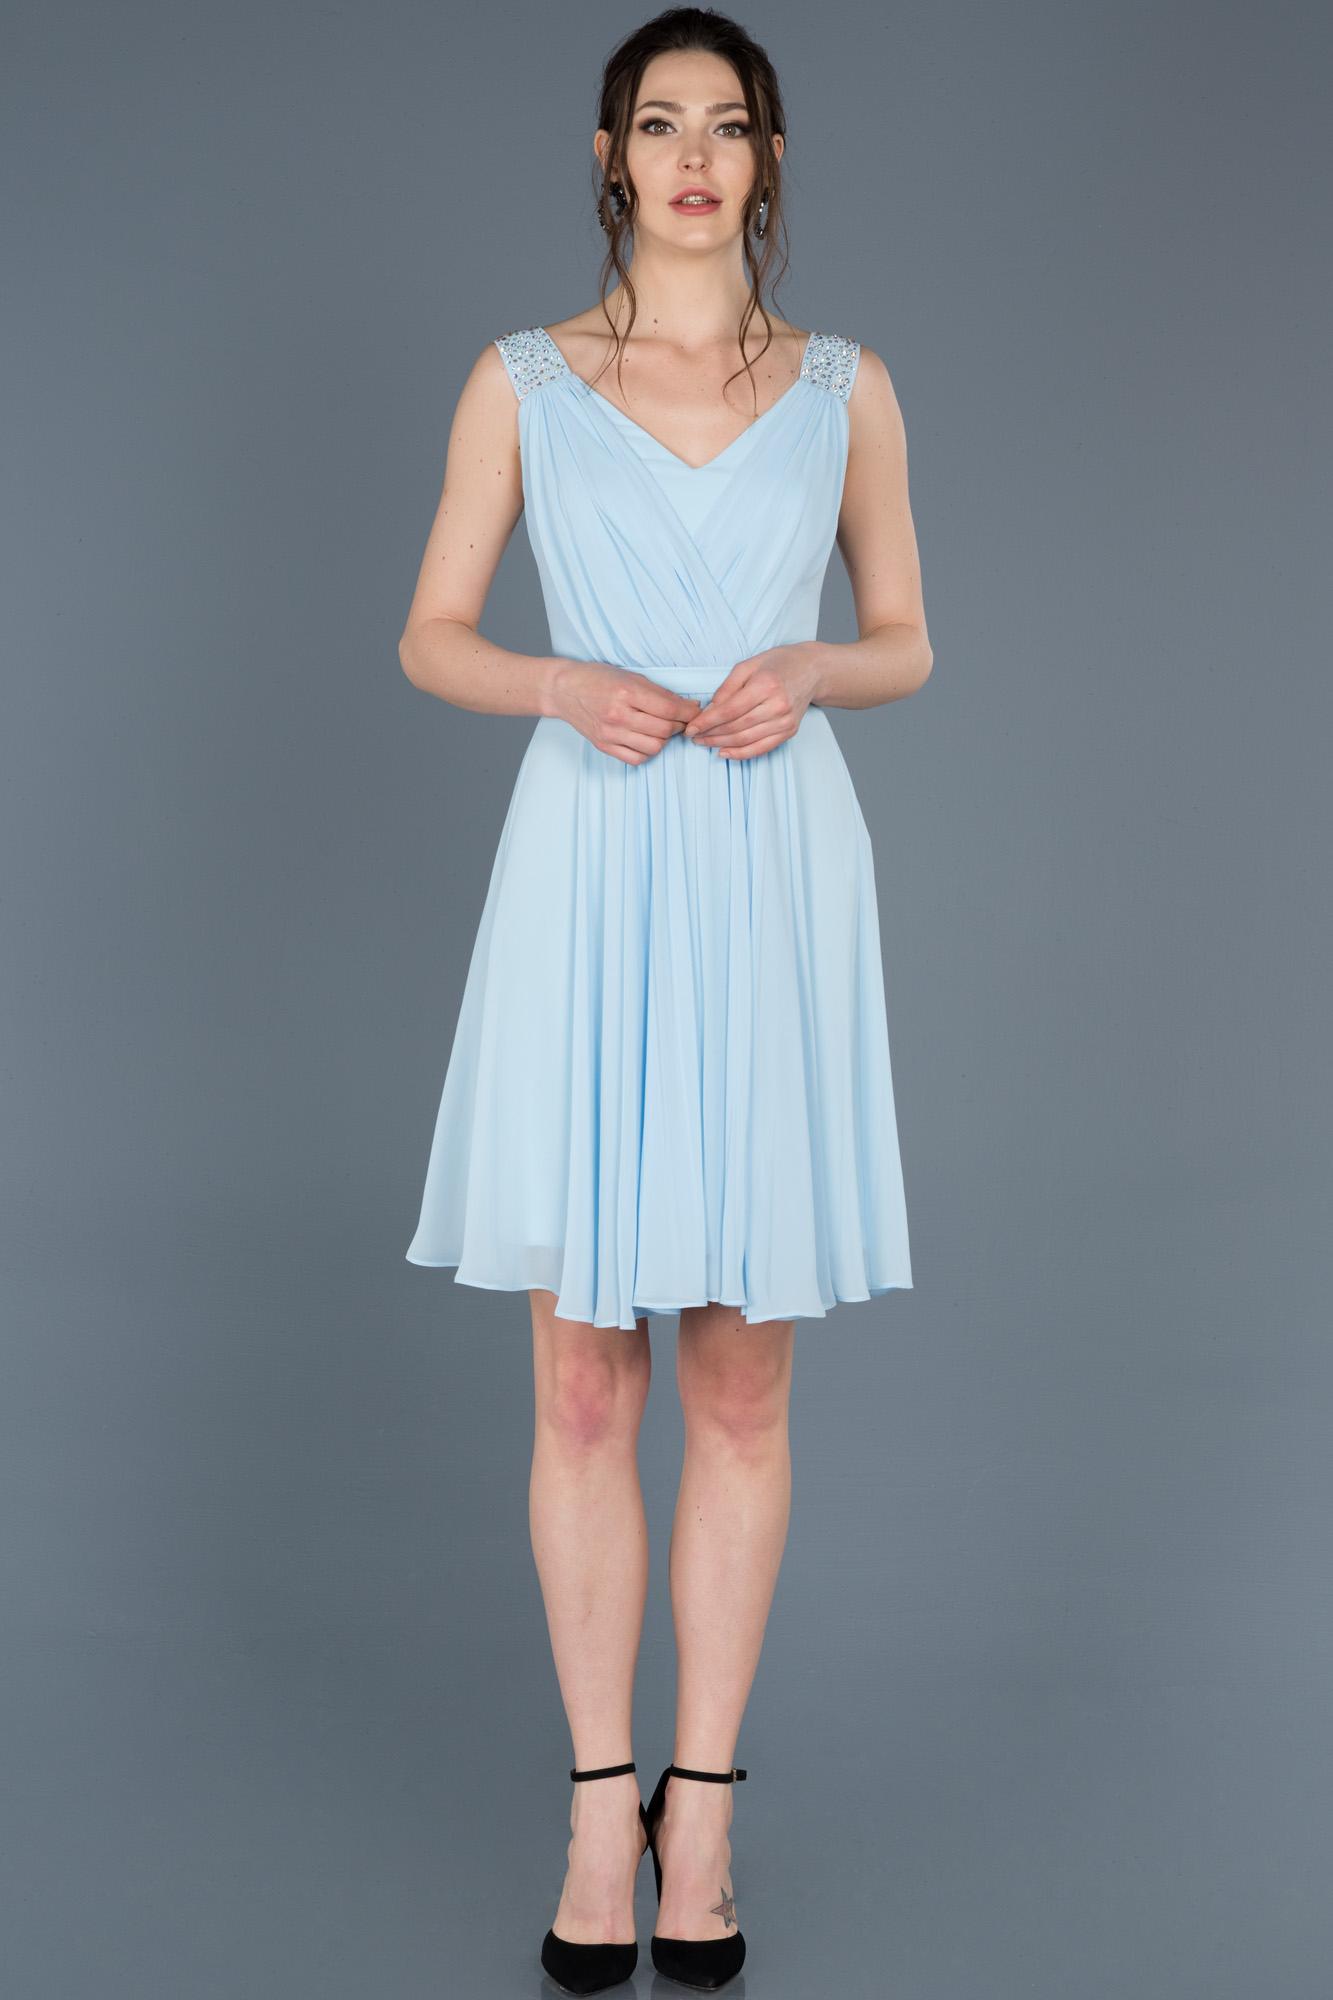 Mavi Kısa V Yaka Mezuniyet Elbisesi